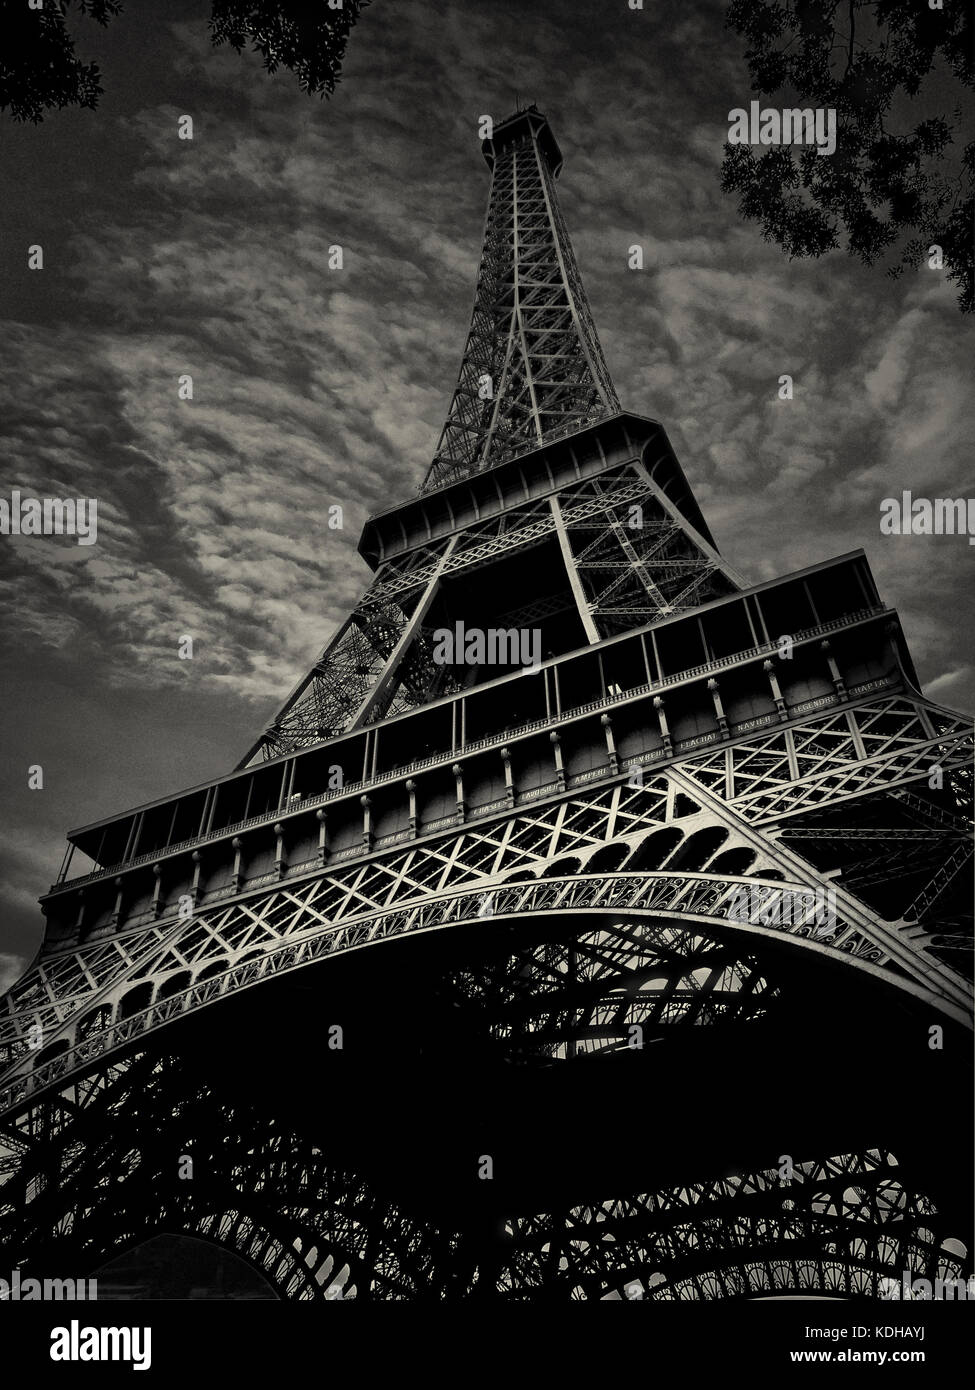 Eiffel Tower A Black White Photograph Paris France Stock Photo Alamy